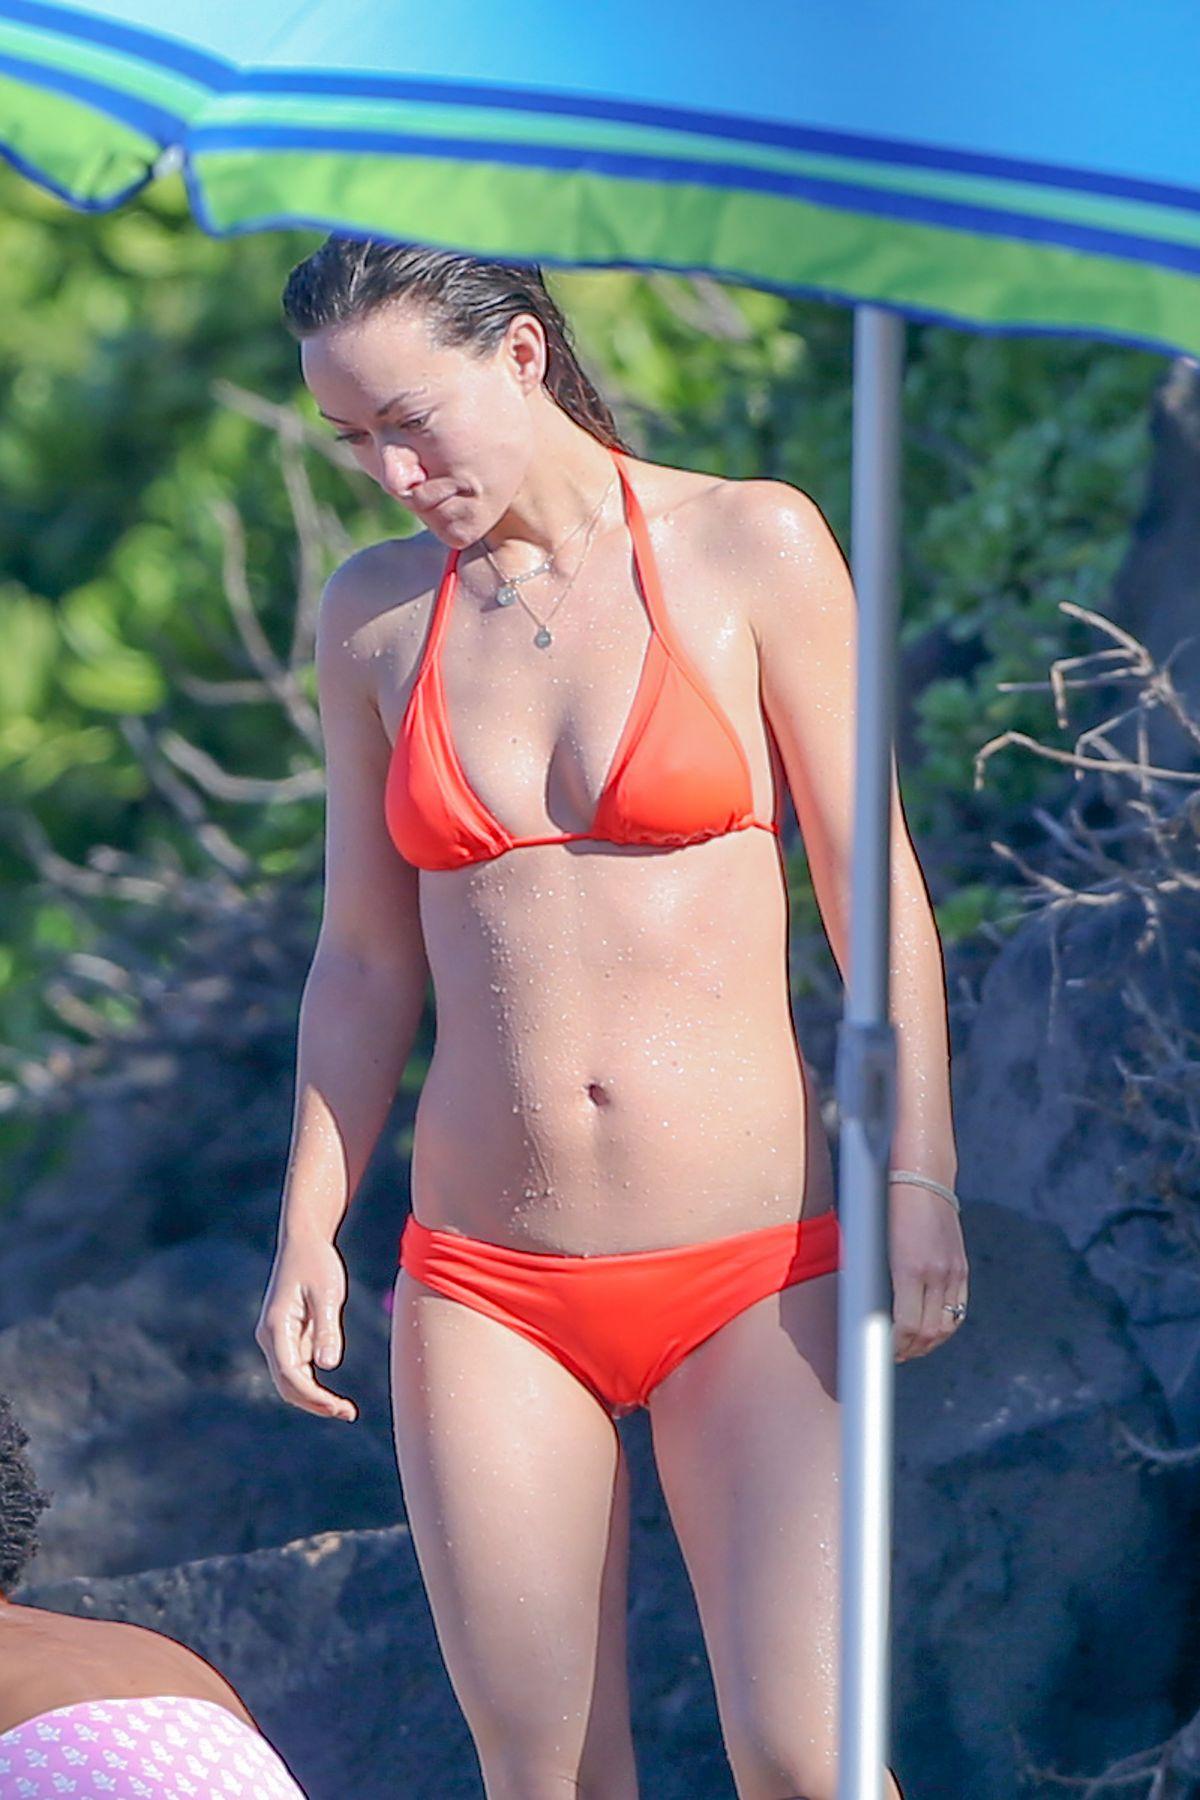 Olivia Wilde Bikini Bodies Pic 21 of 35